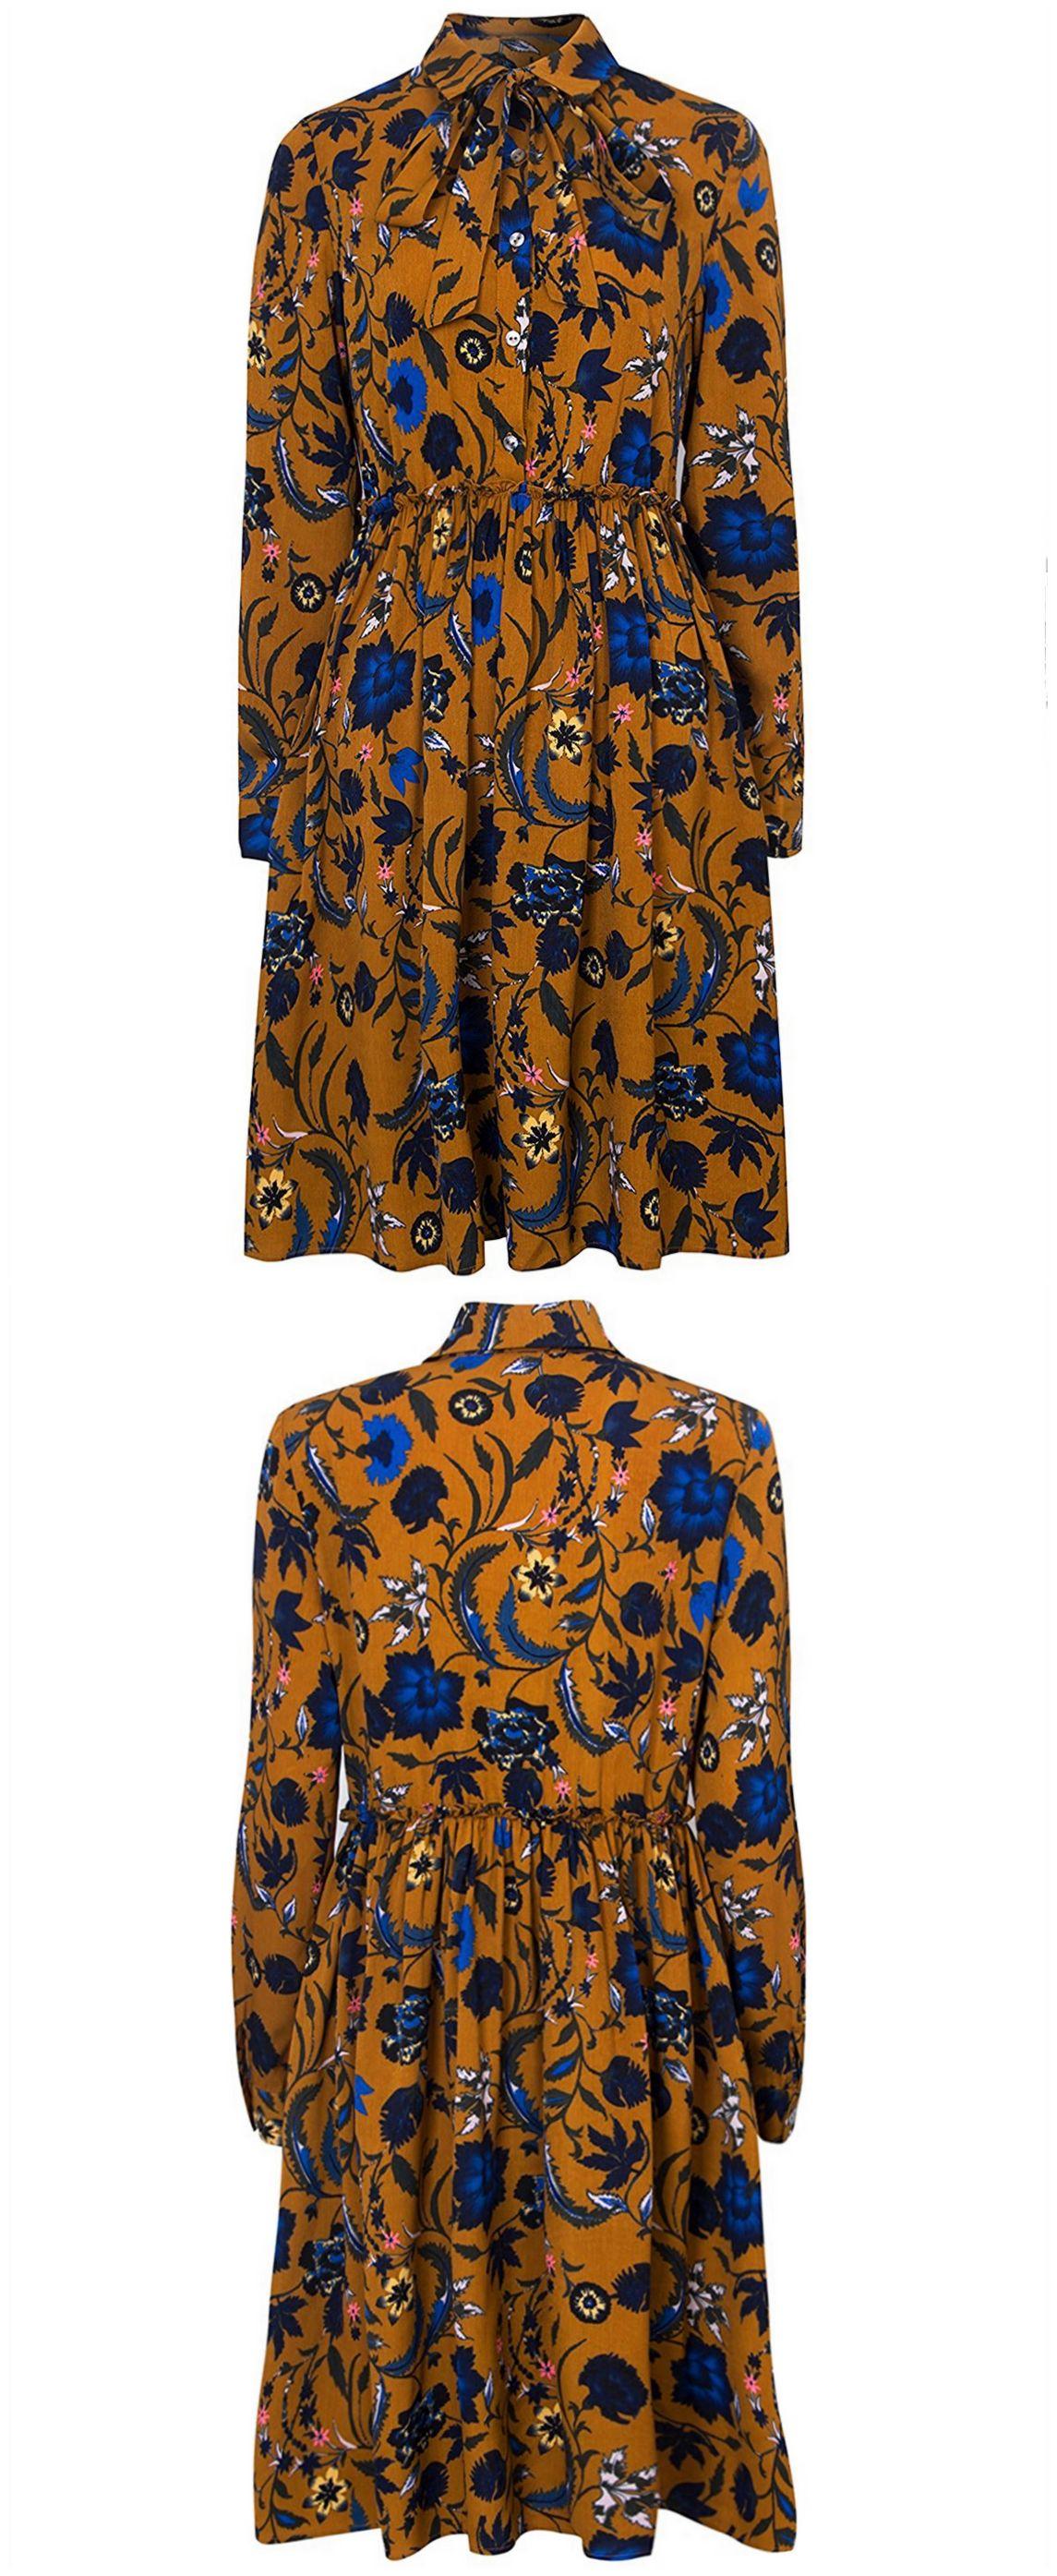 815cc64d11 Floral Print Long Sleeve Shirt Dress - Joe Maloy